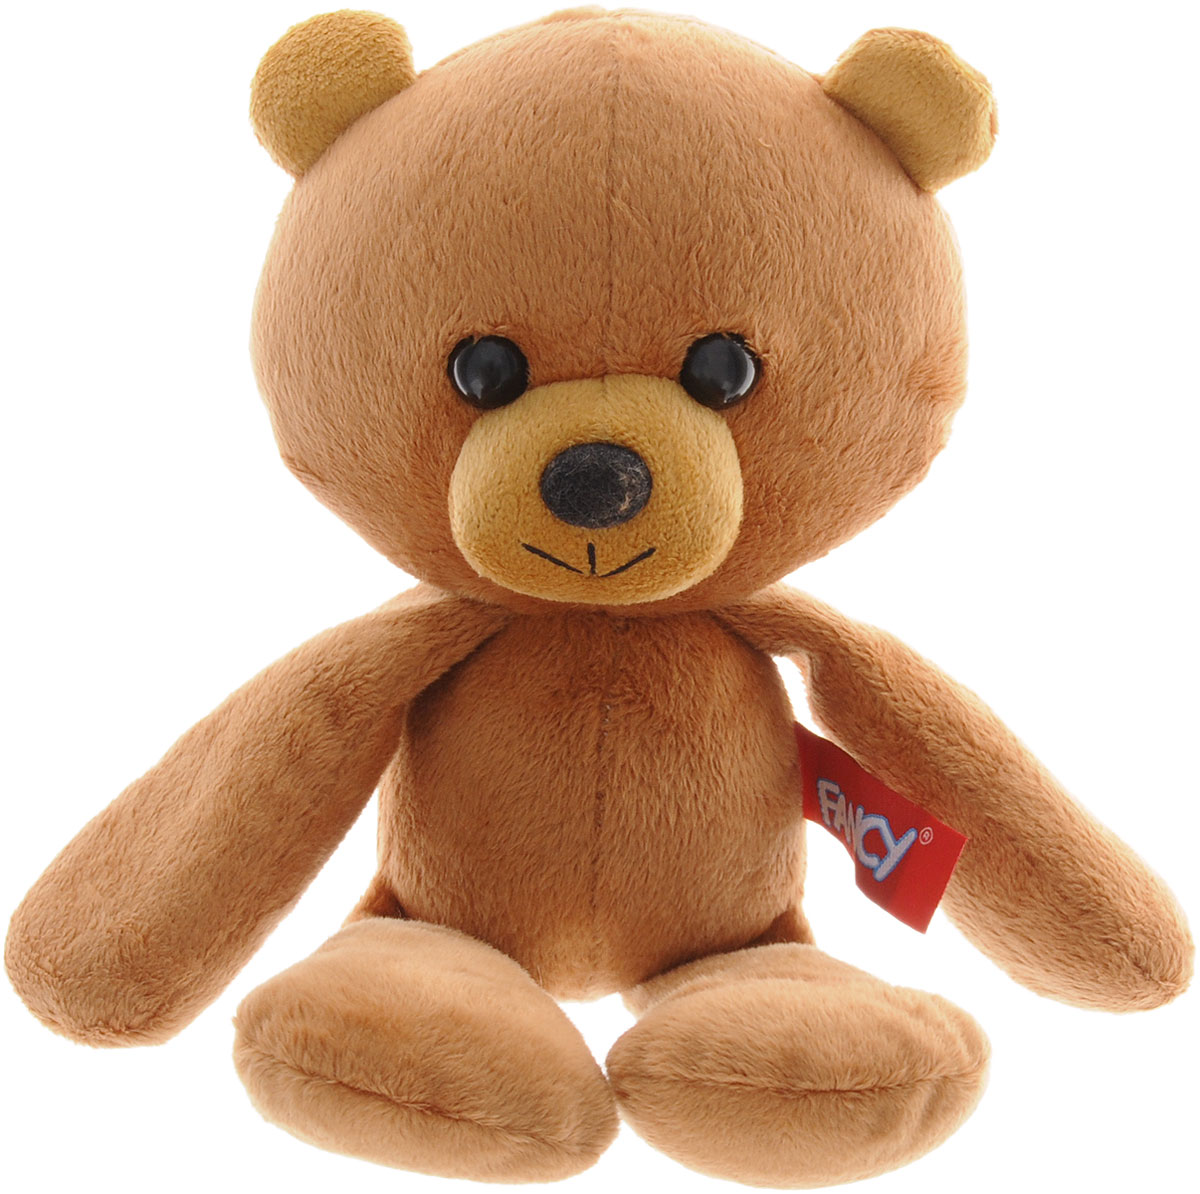 Fancy Мягкая игрушка Мишка Бобо 26 см